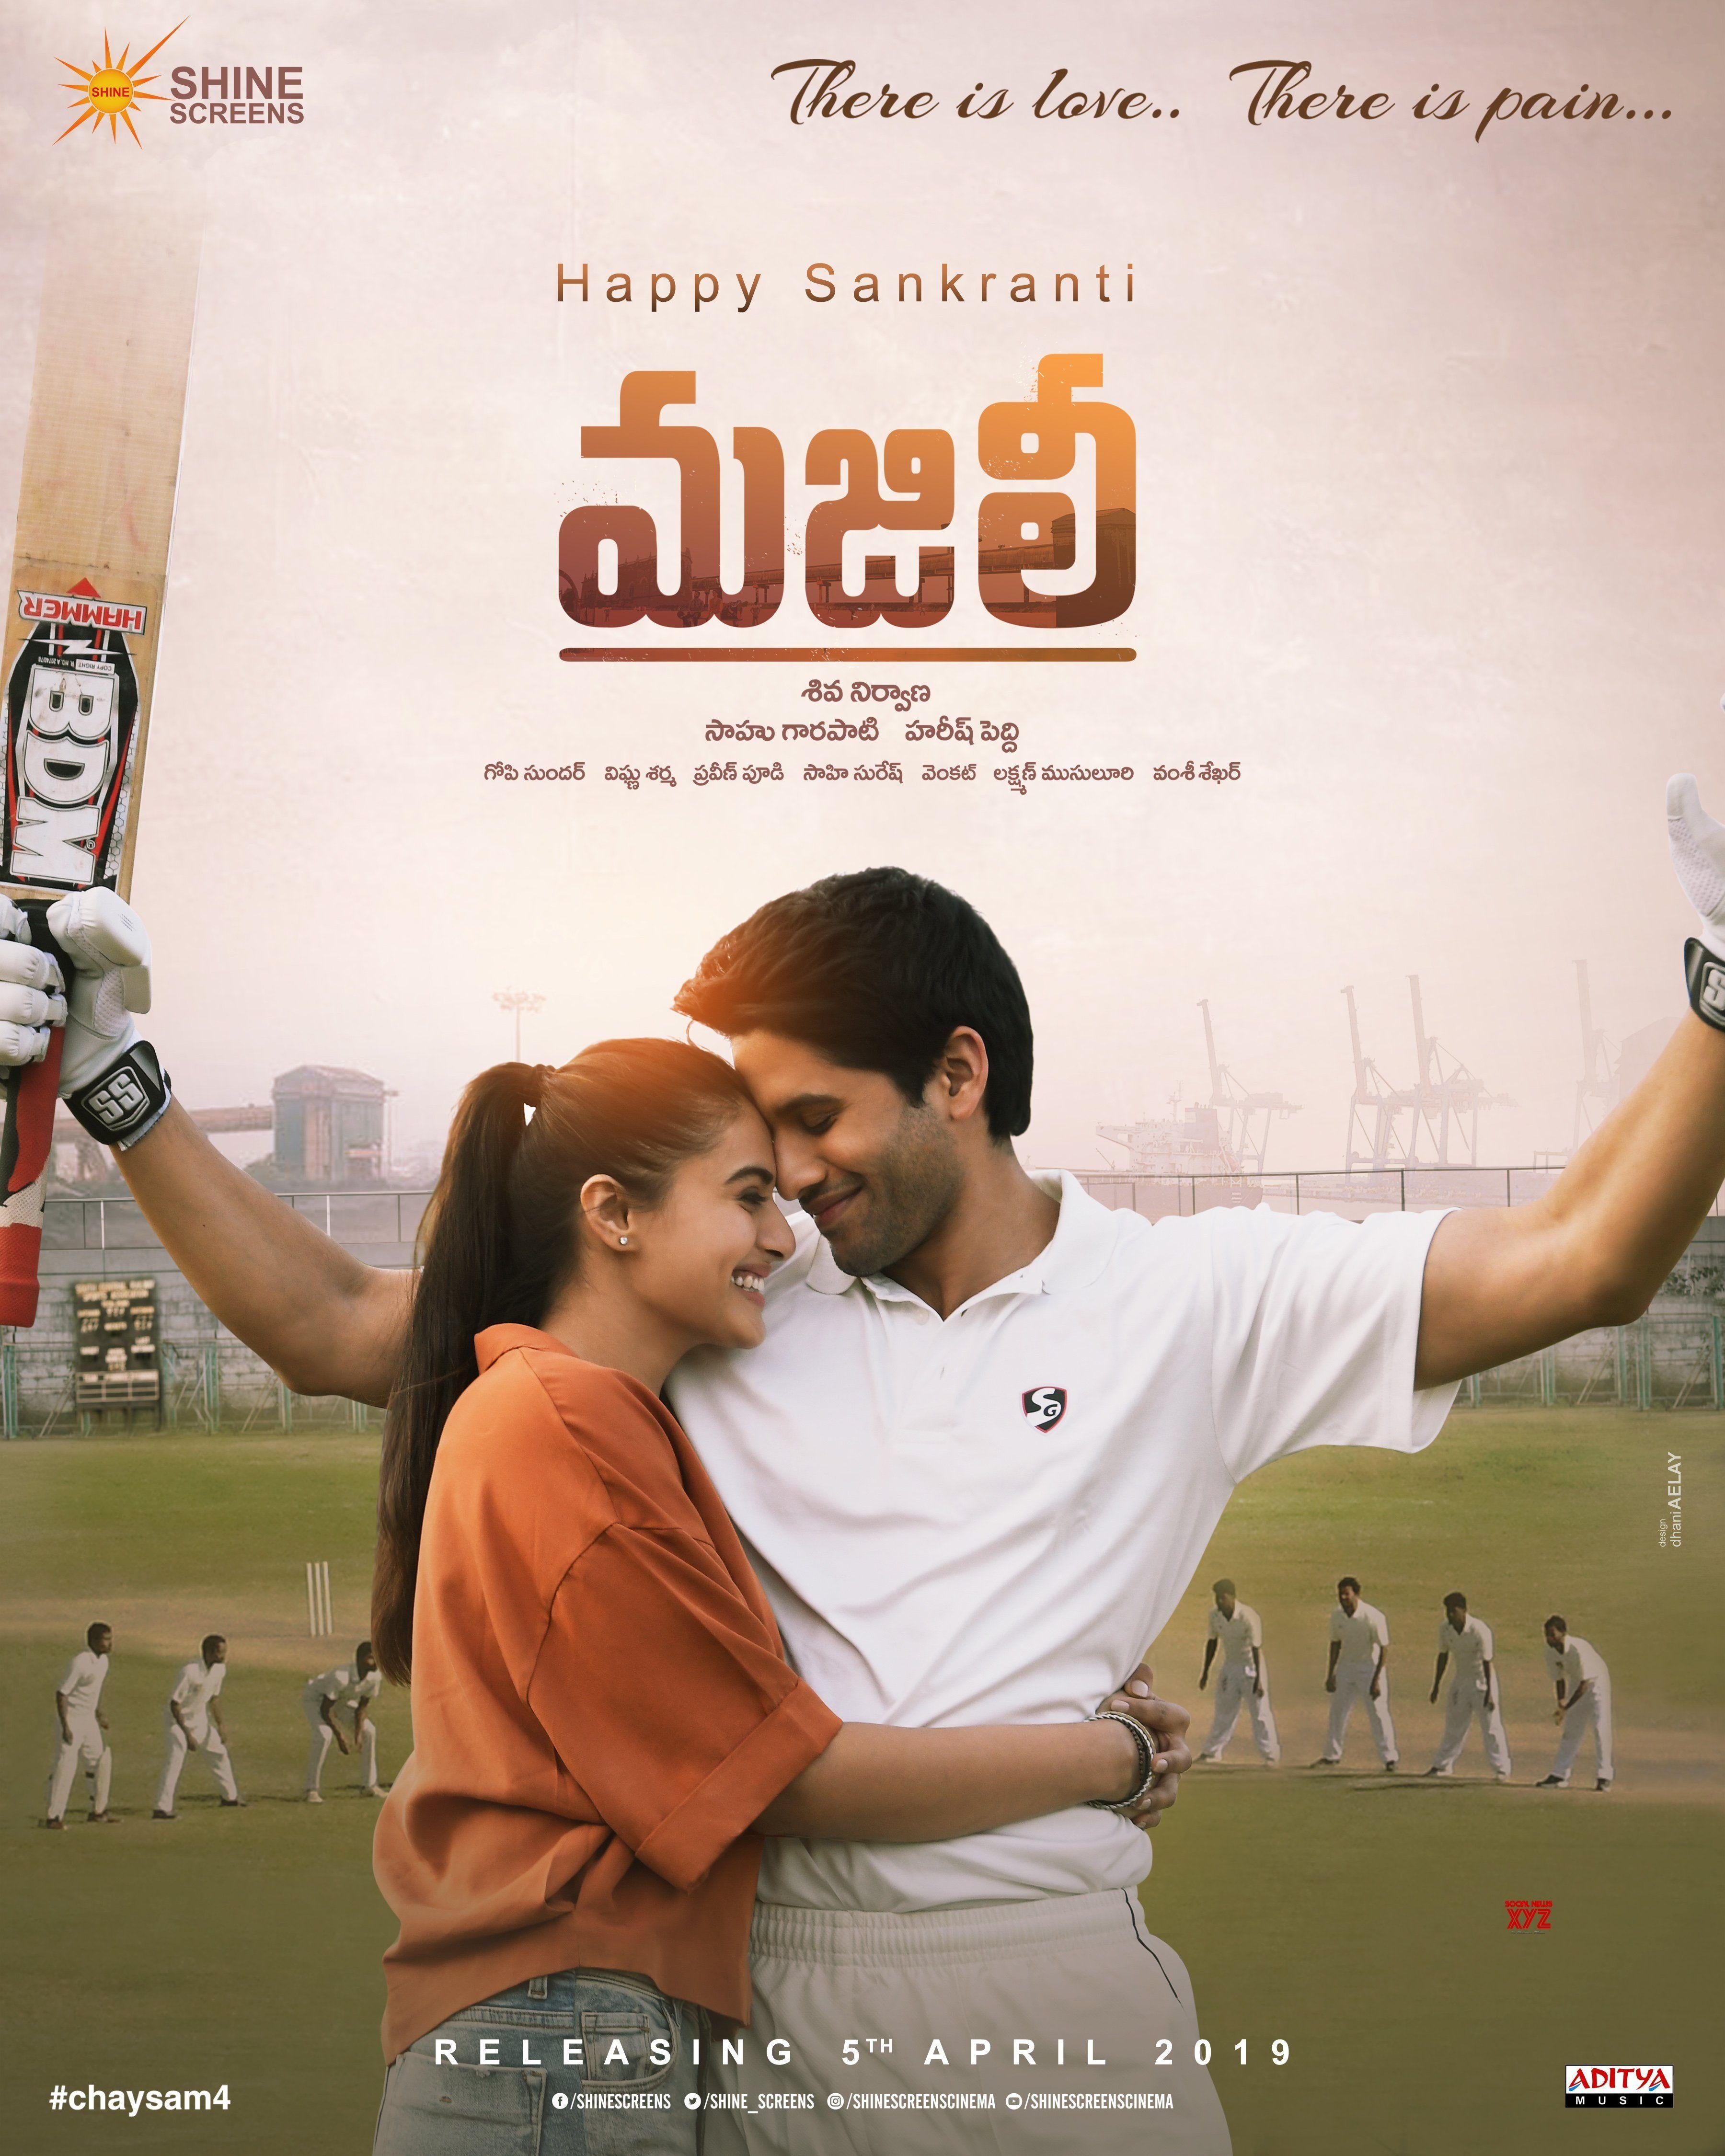 Naga Chaitanya Samantha And Shiva Nirvana Film Majili Release Date Hd Poster And Still Download Free Movies Online Telugu Movies Download Telugu Movies